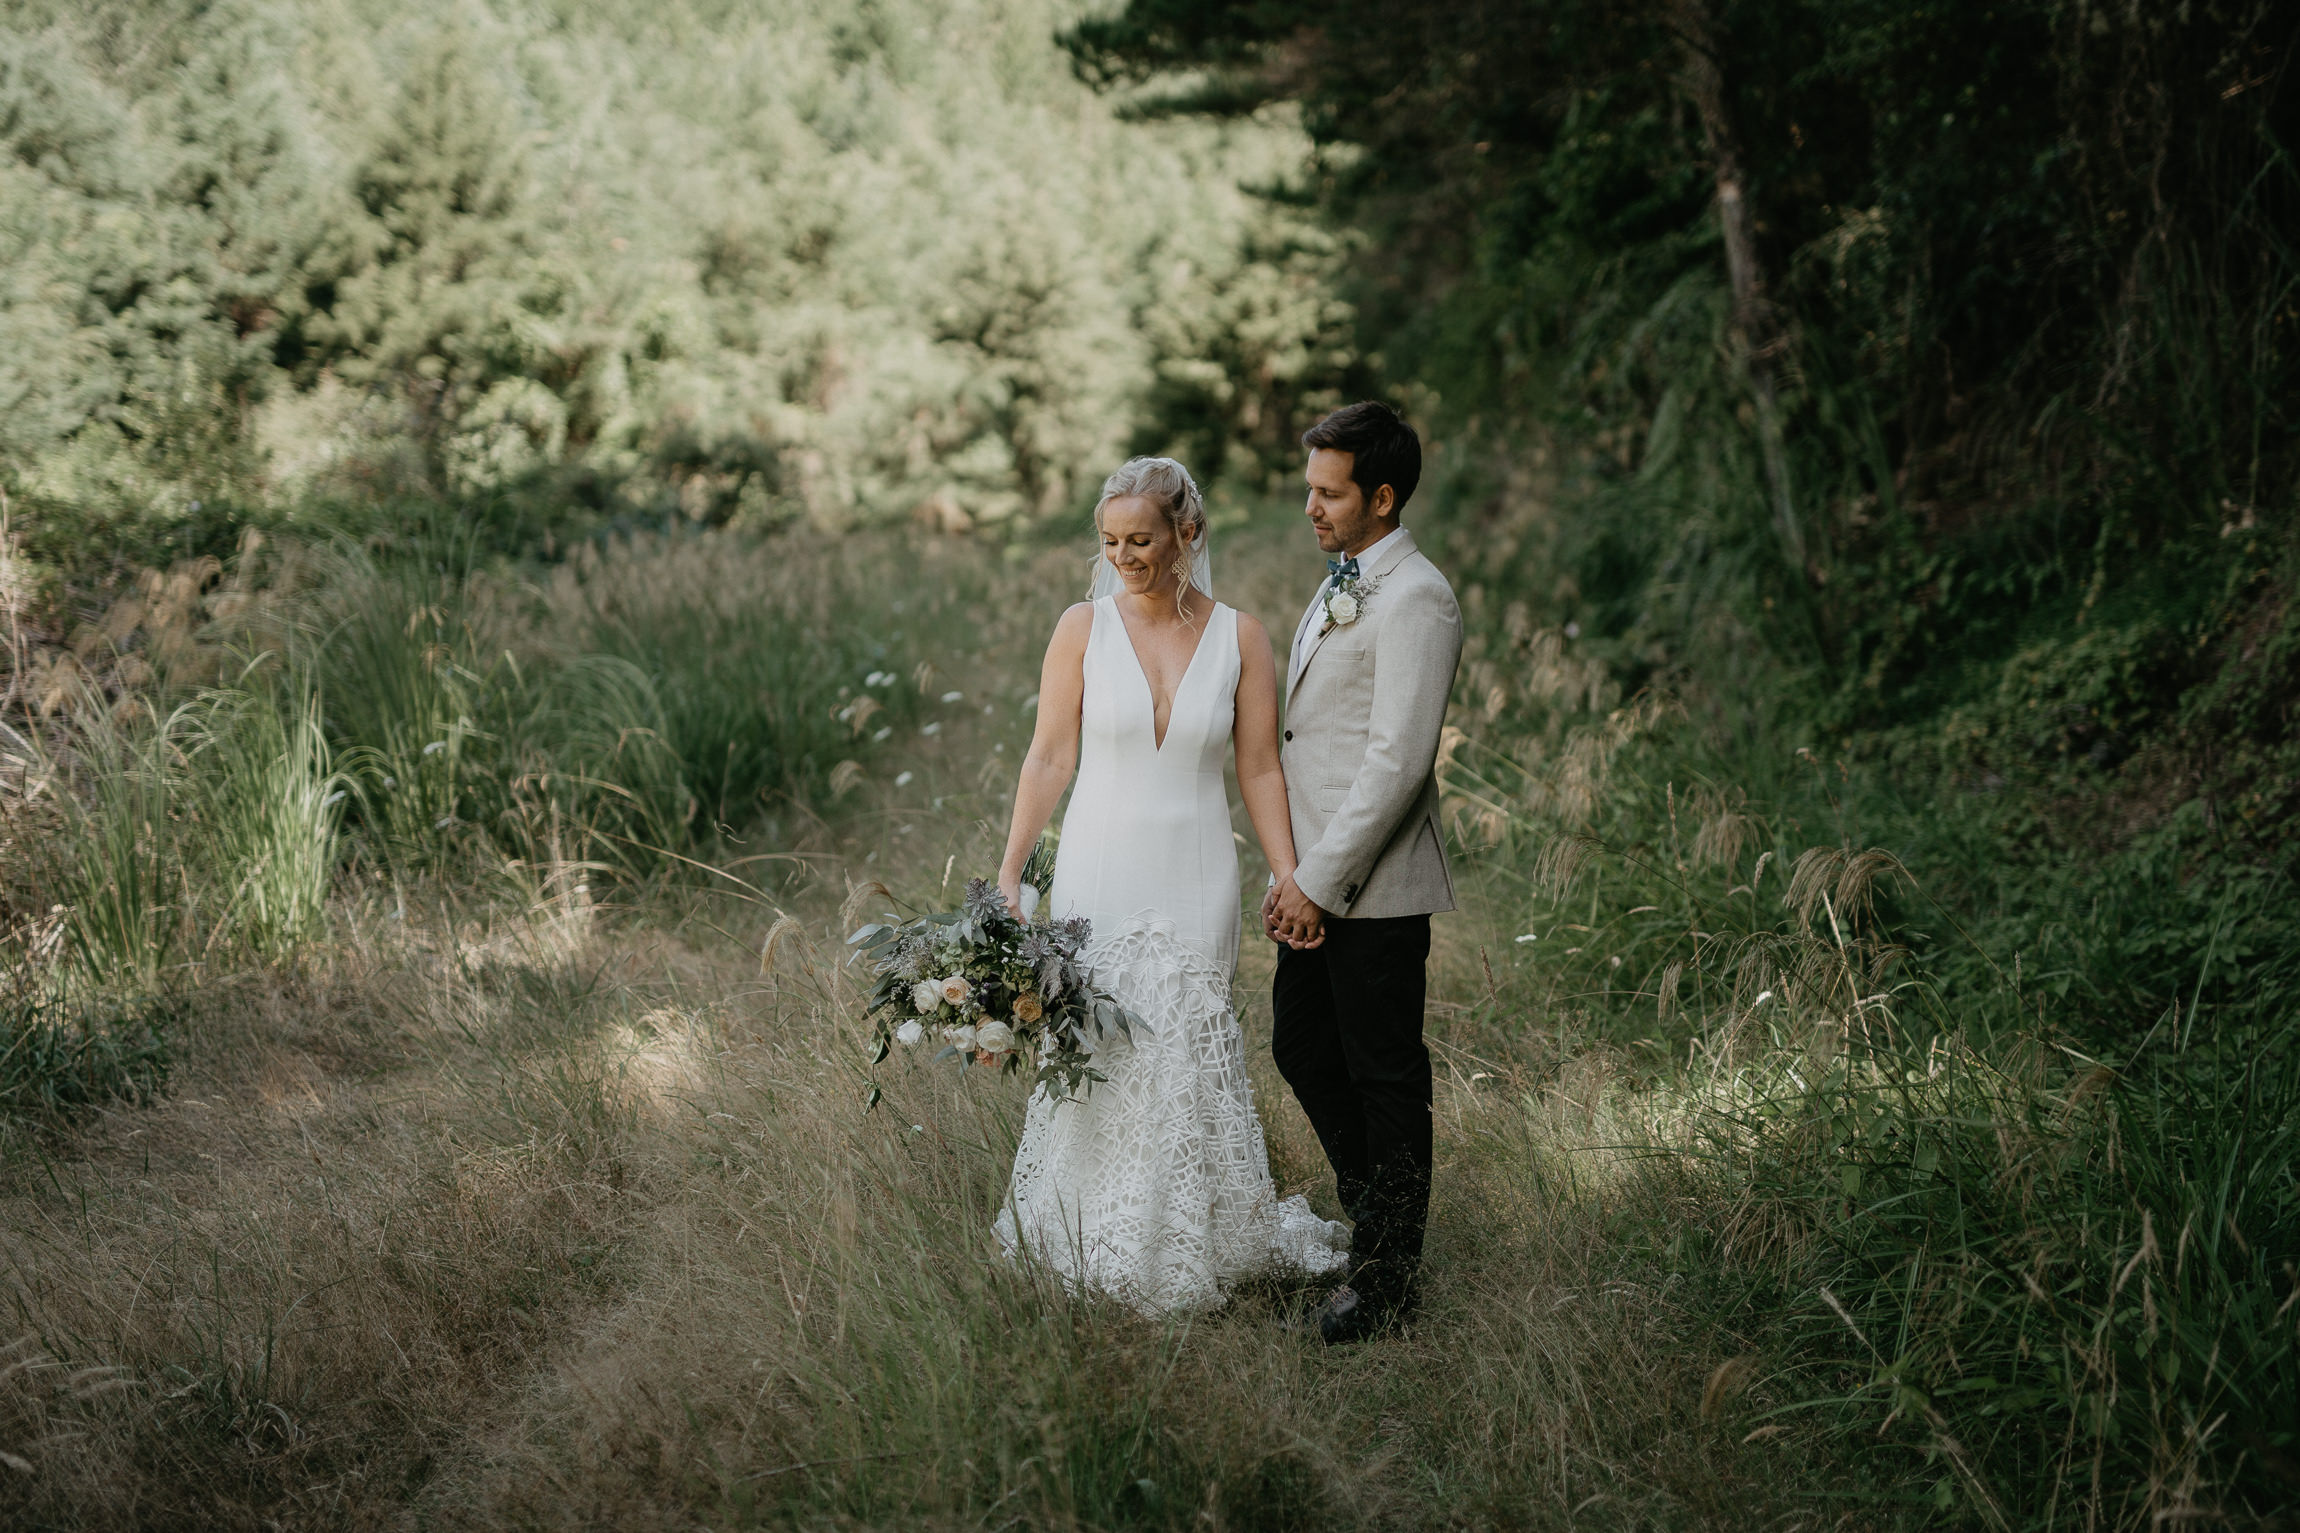 oldforestschool-wedding-blog-81.jpg